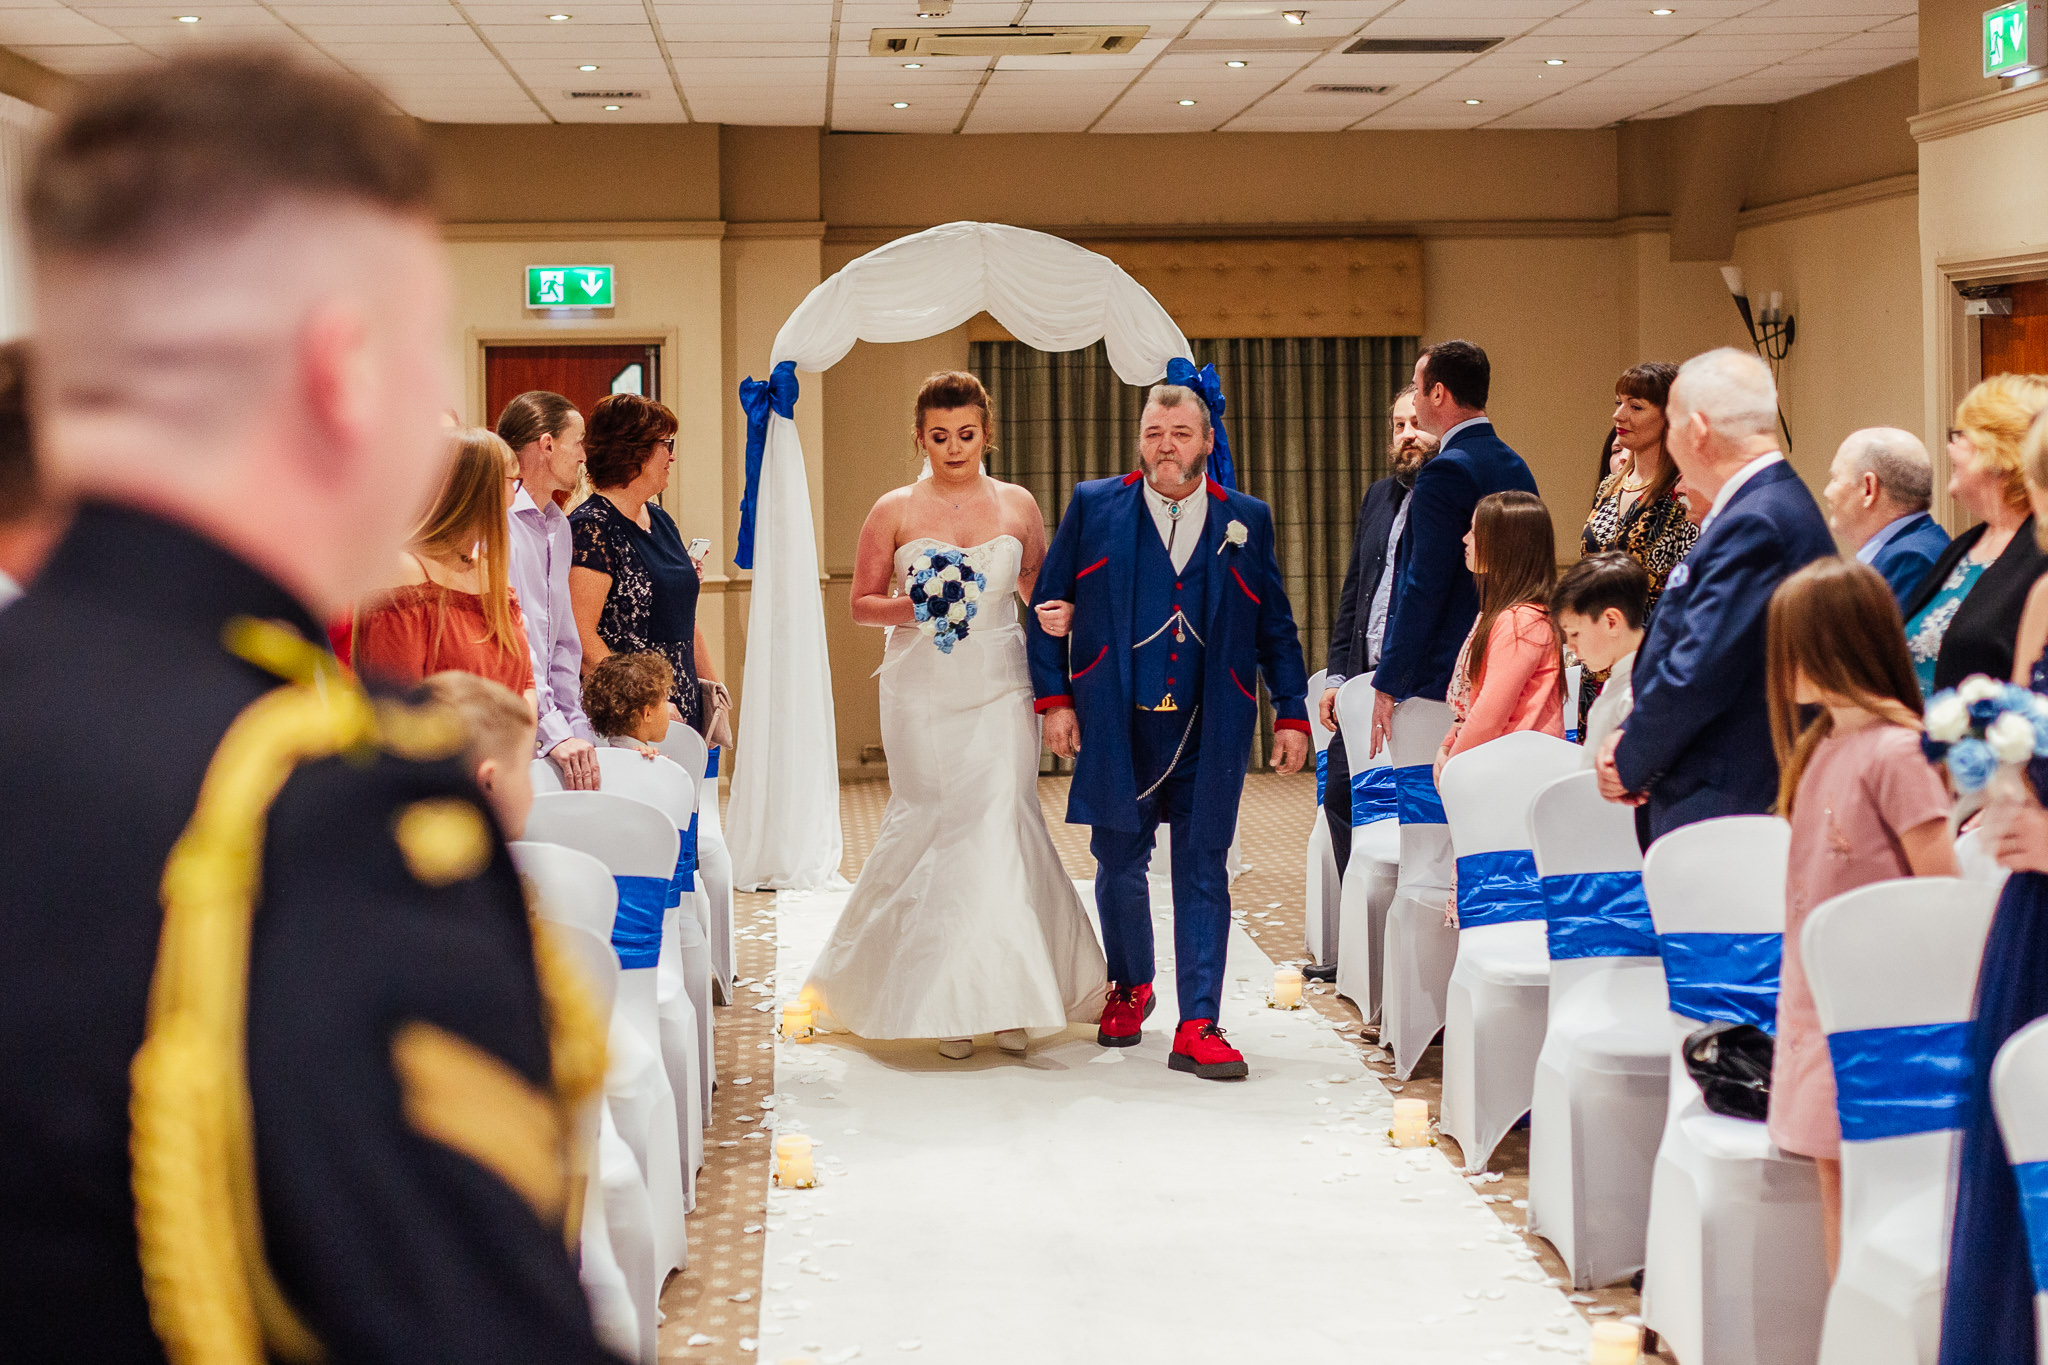 Mollingtonbanastre_wedding-3.jpg